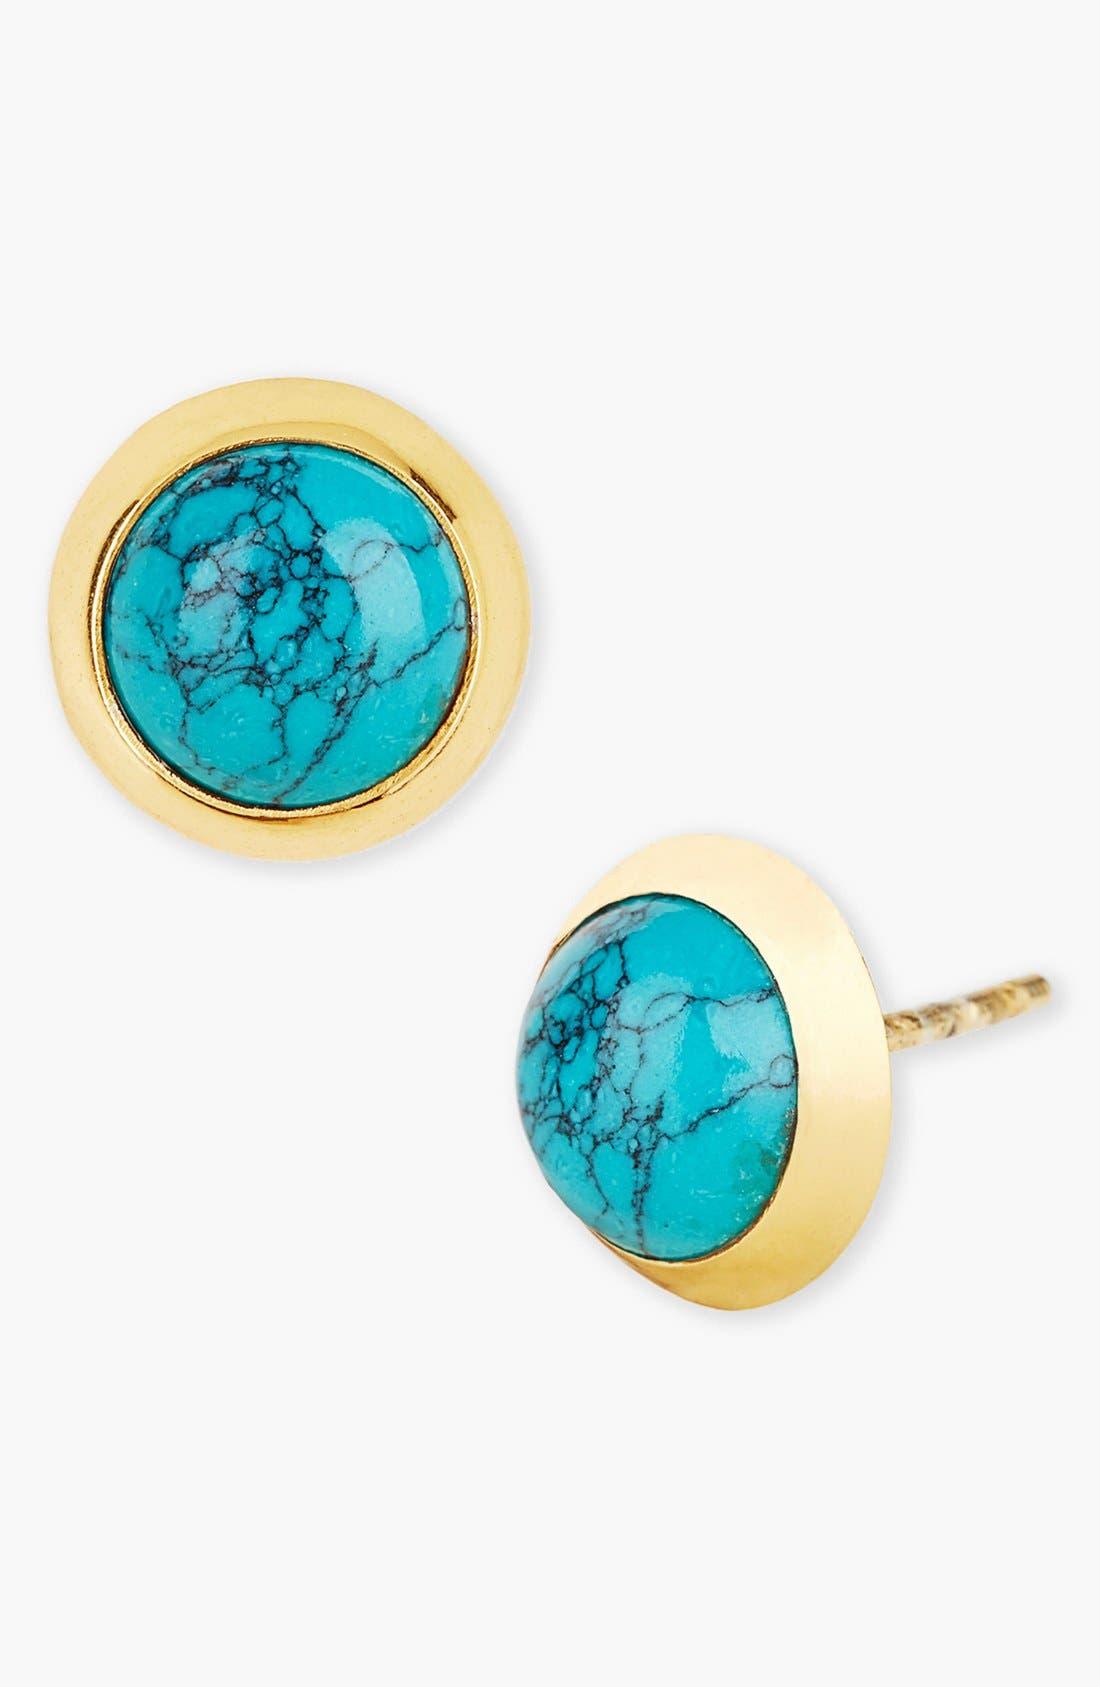 Alternate Image 1 Selected - Argento Vivo Stud Earrings (Nordstrom Exclusive)